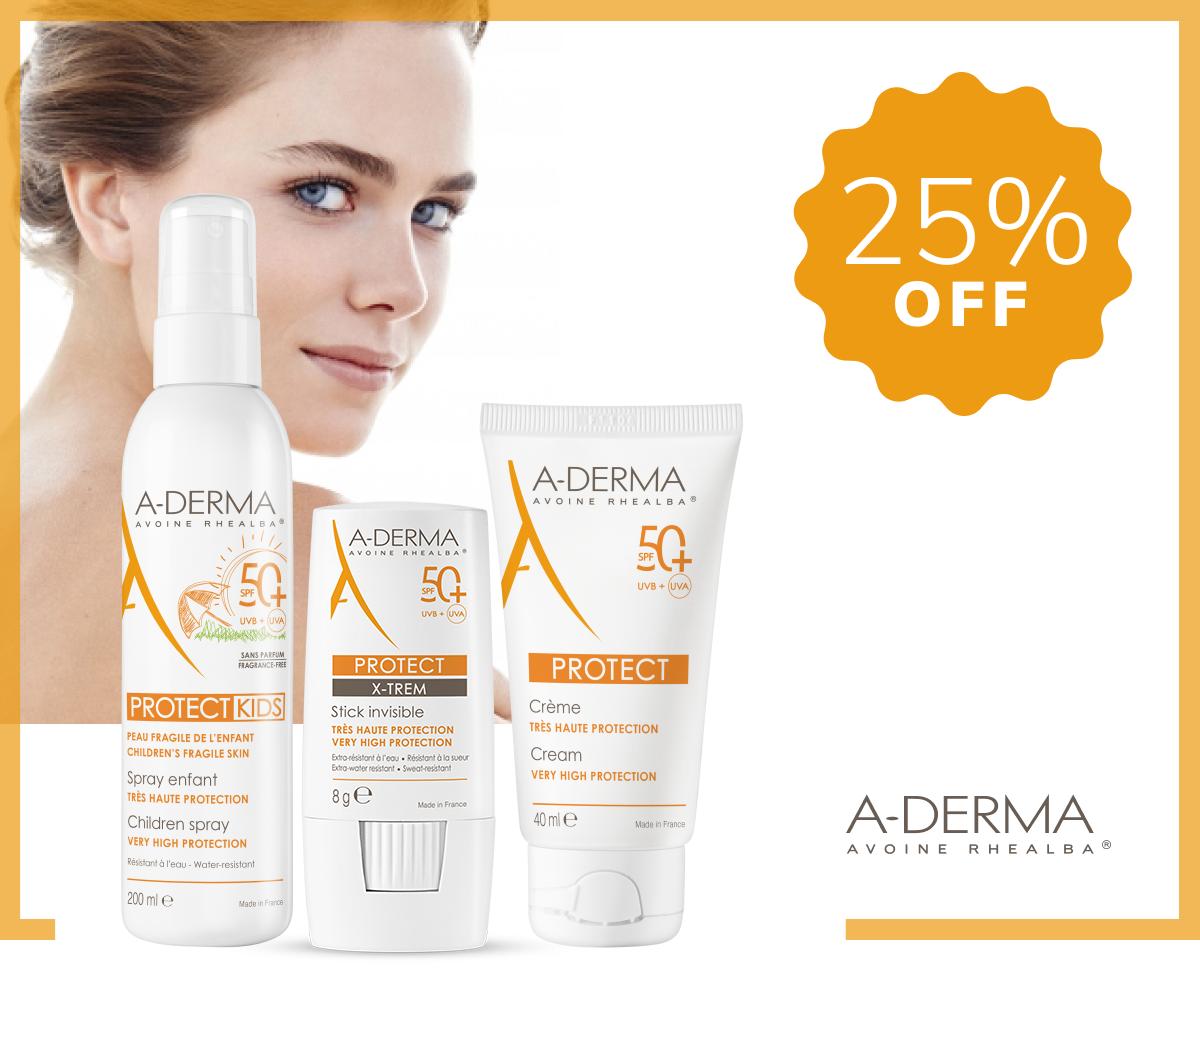 A-Derma Sunscreens